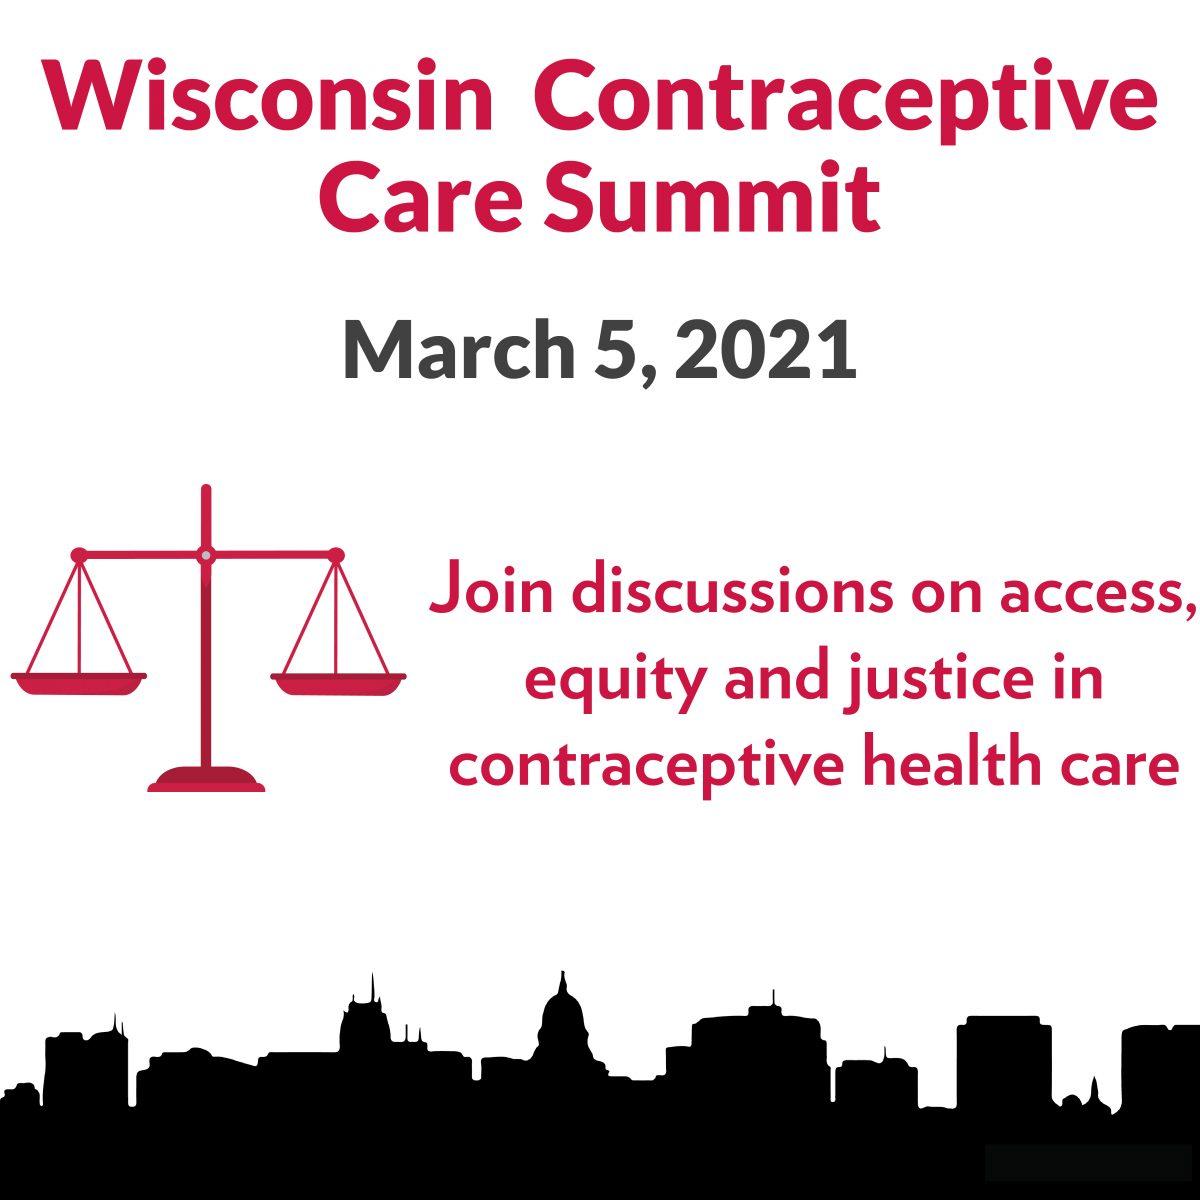 Contraceptive Care Summit social media image